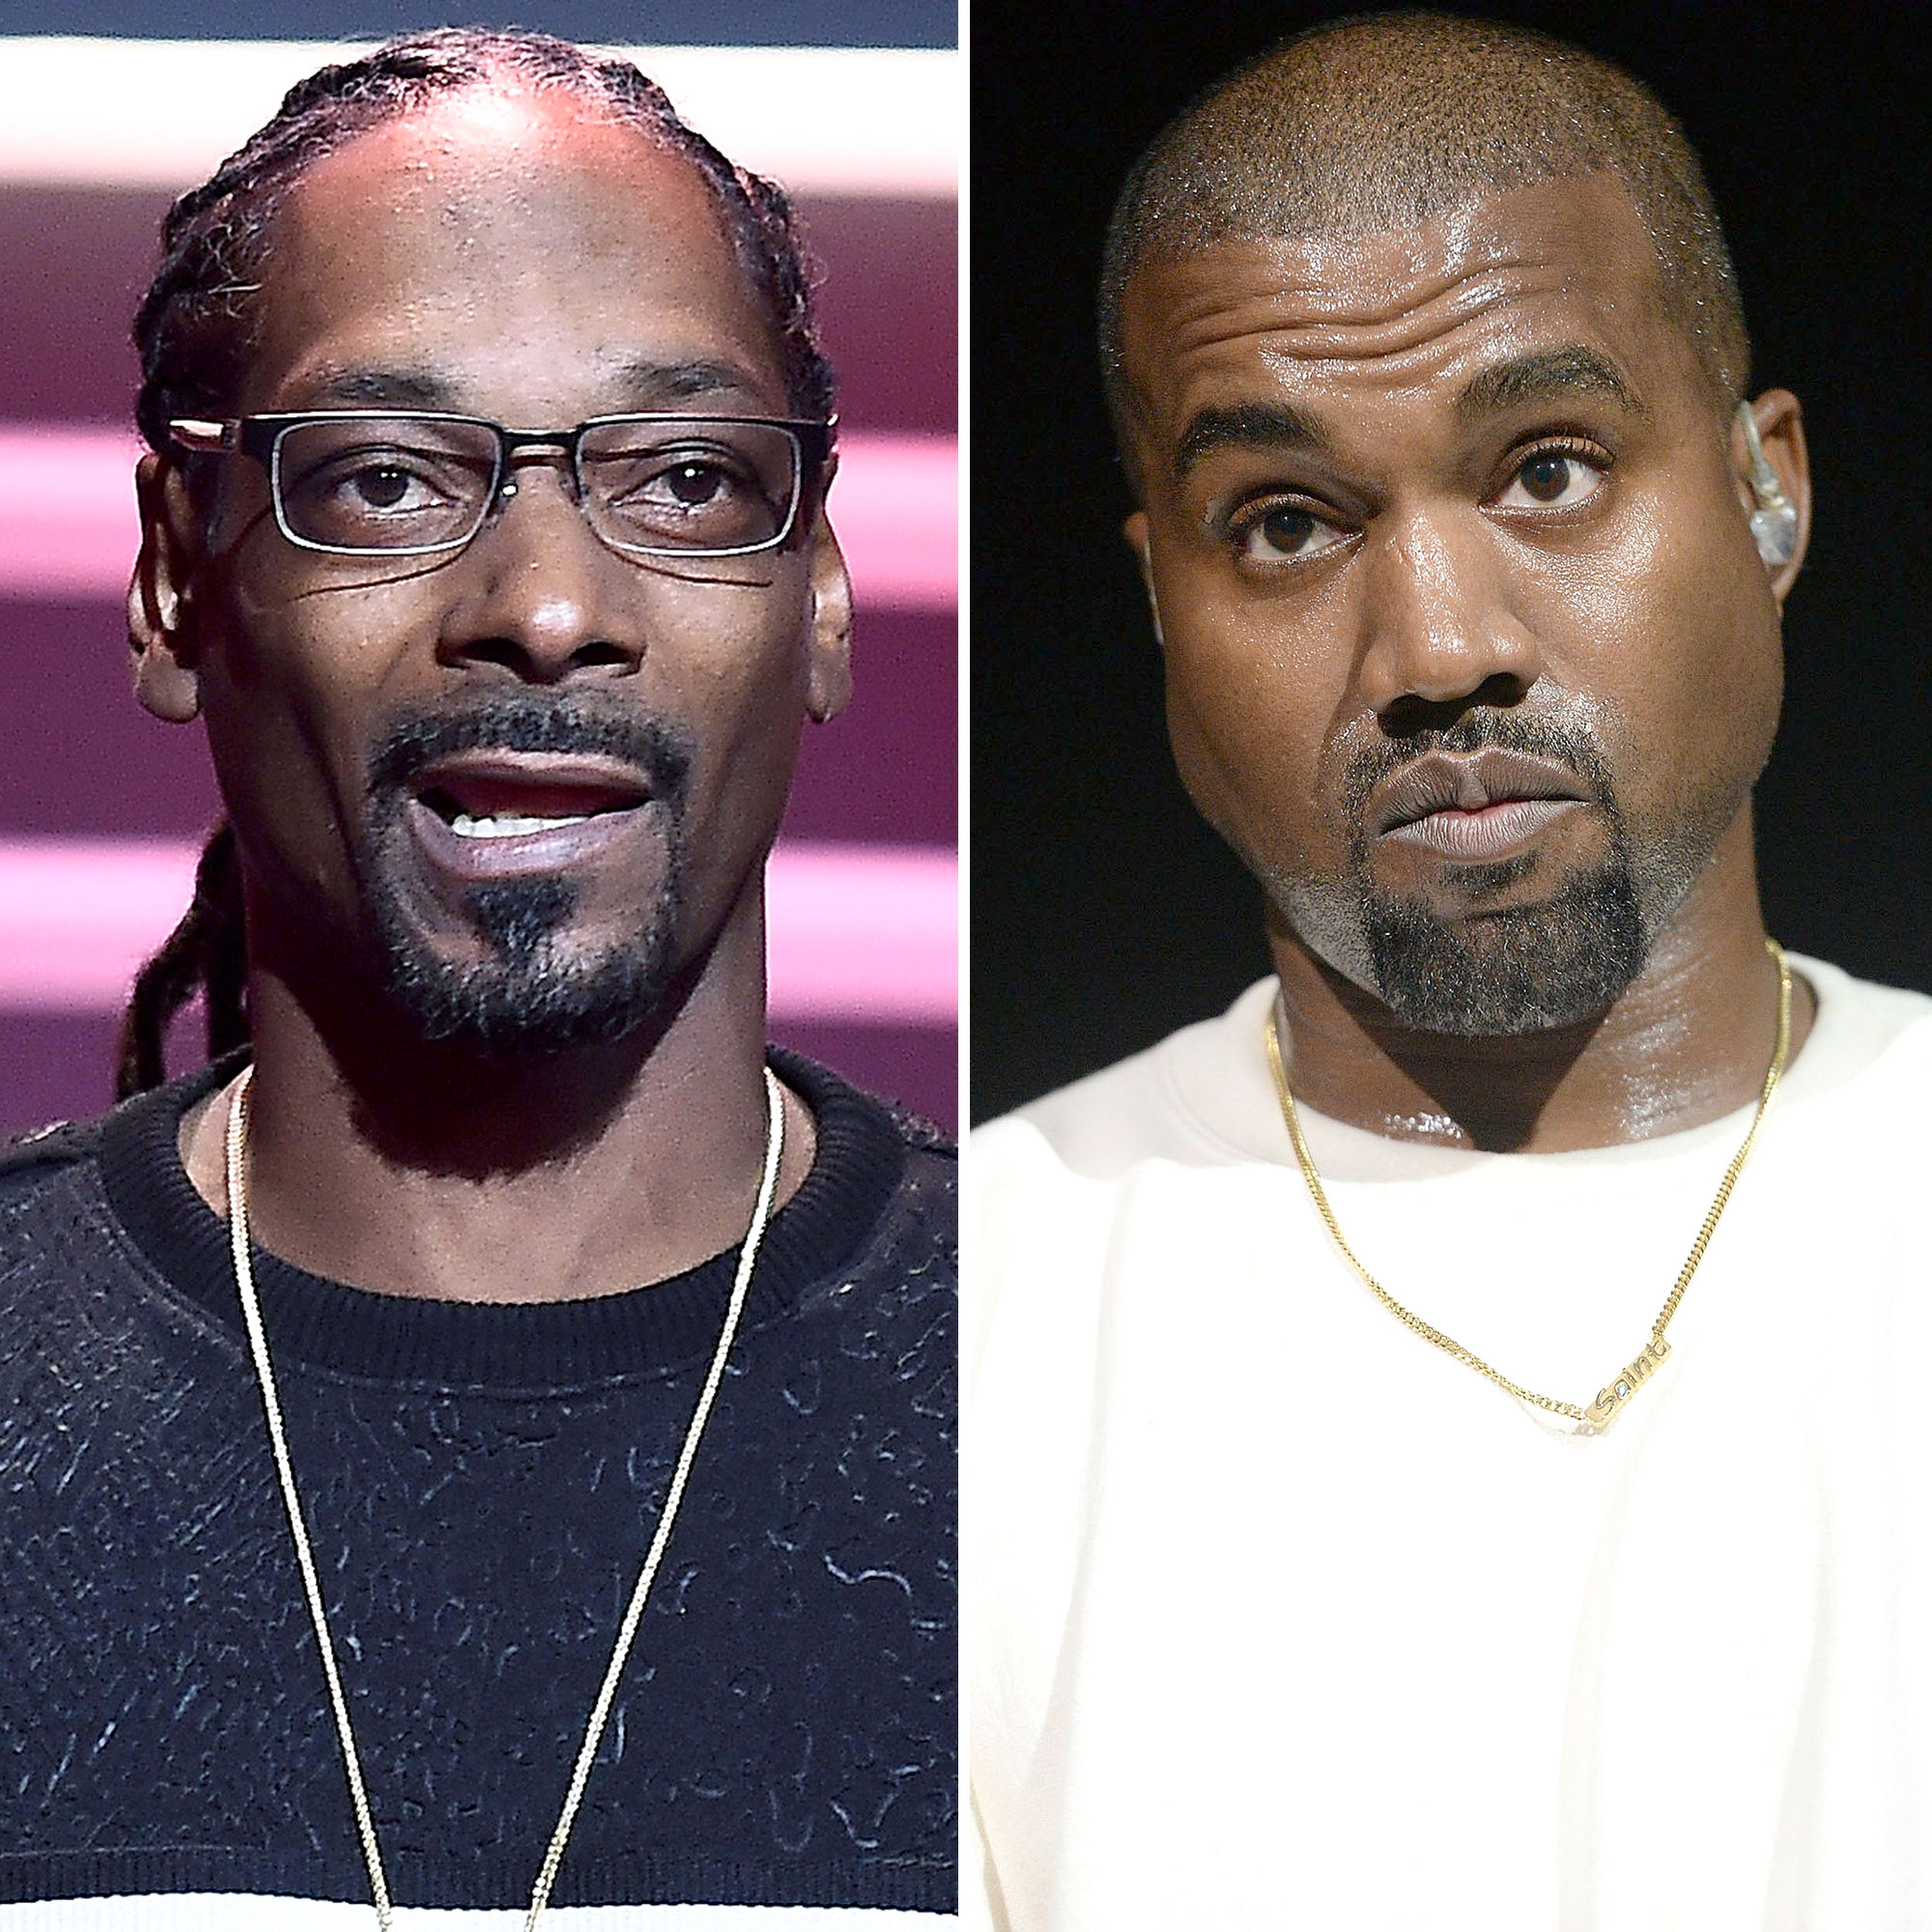 Snoop Dogg, Kanye WEst